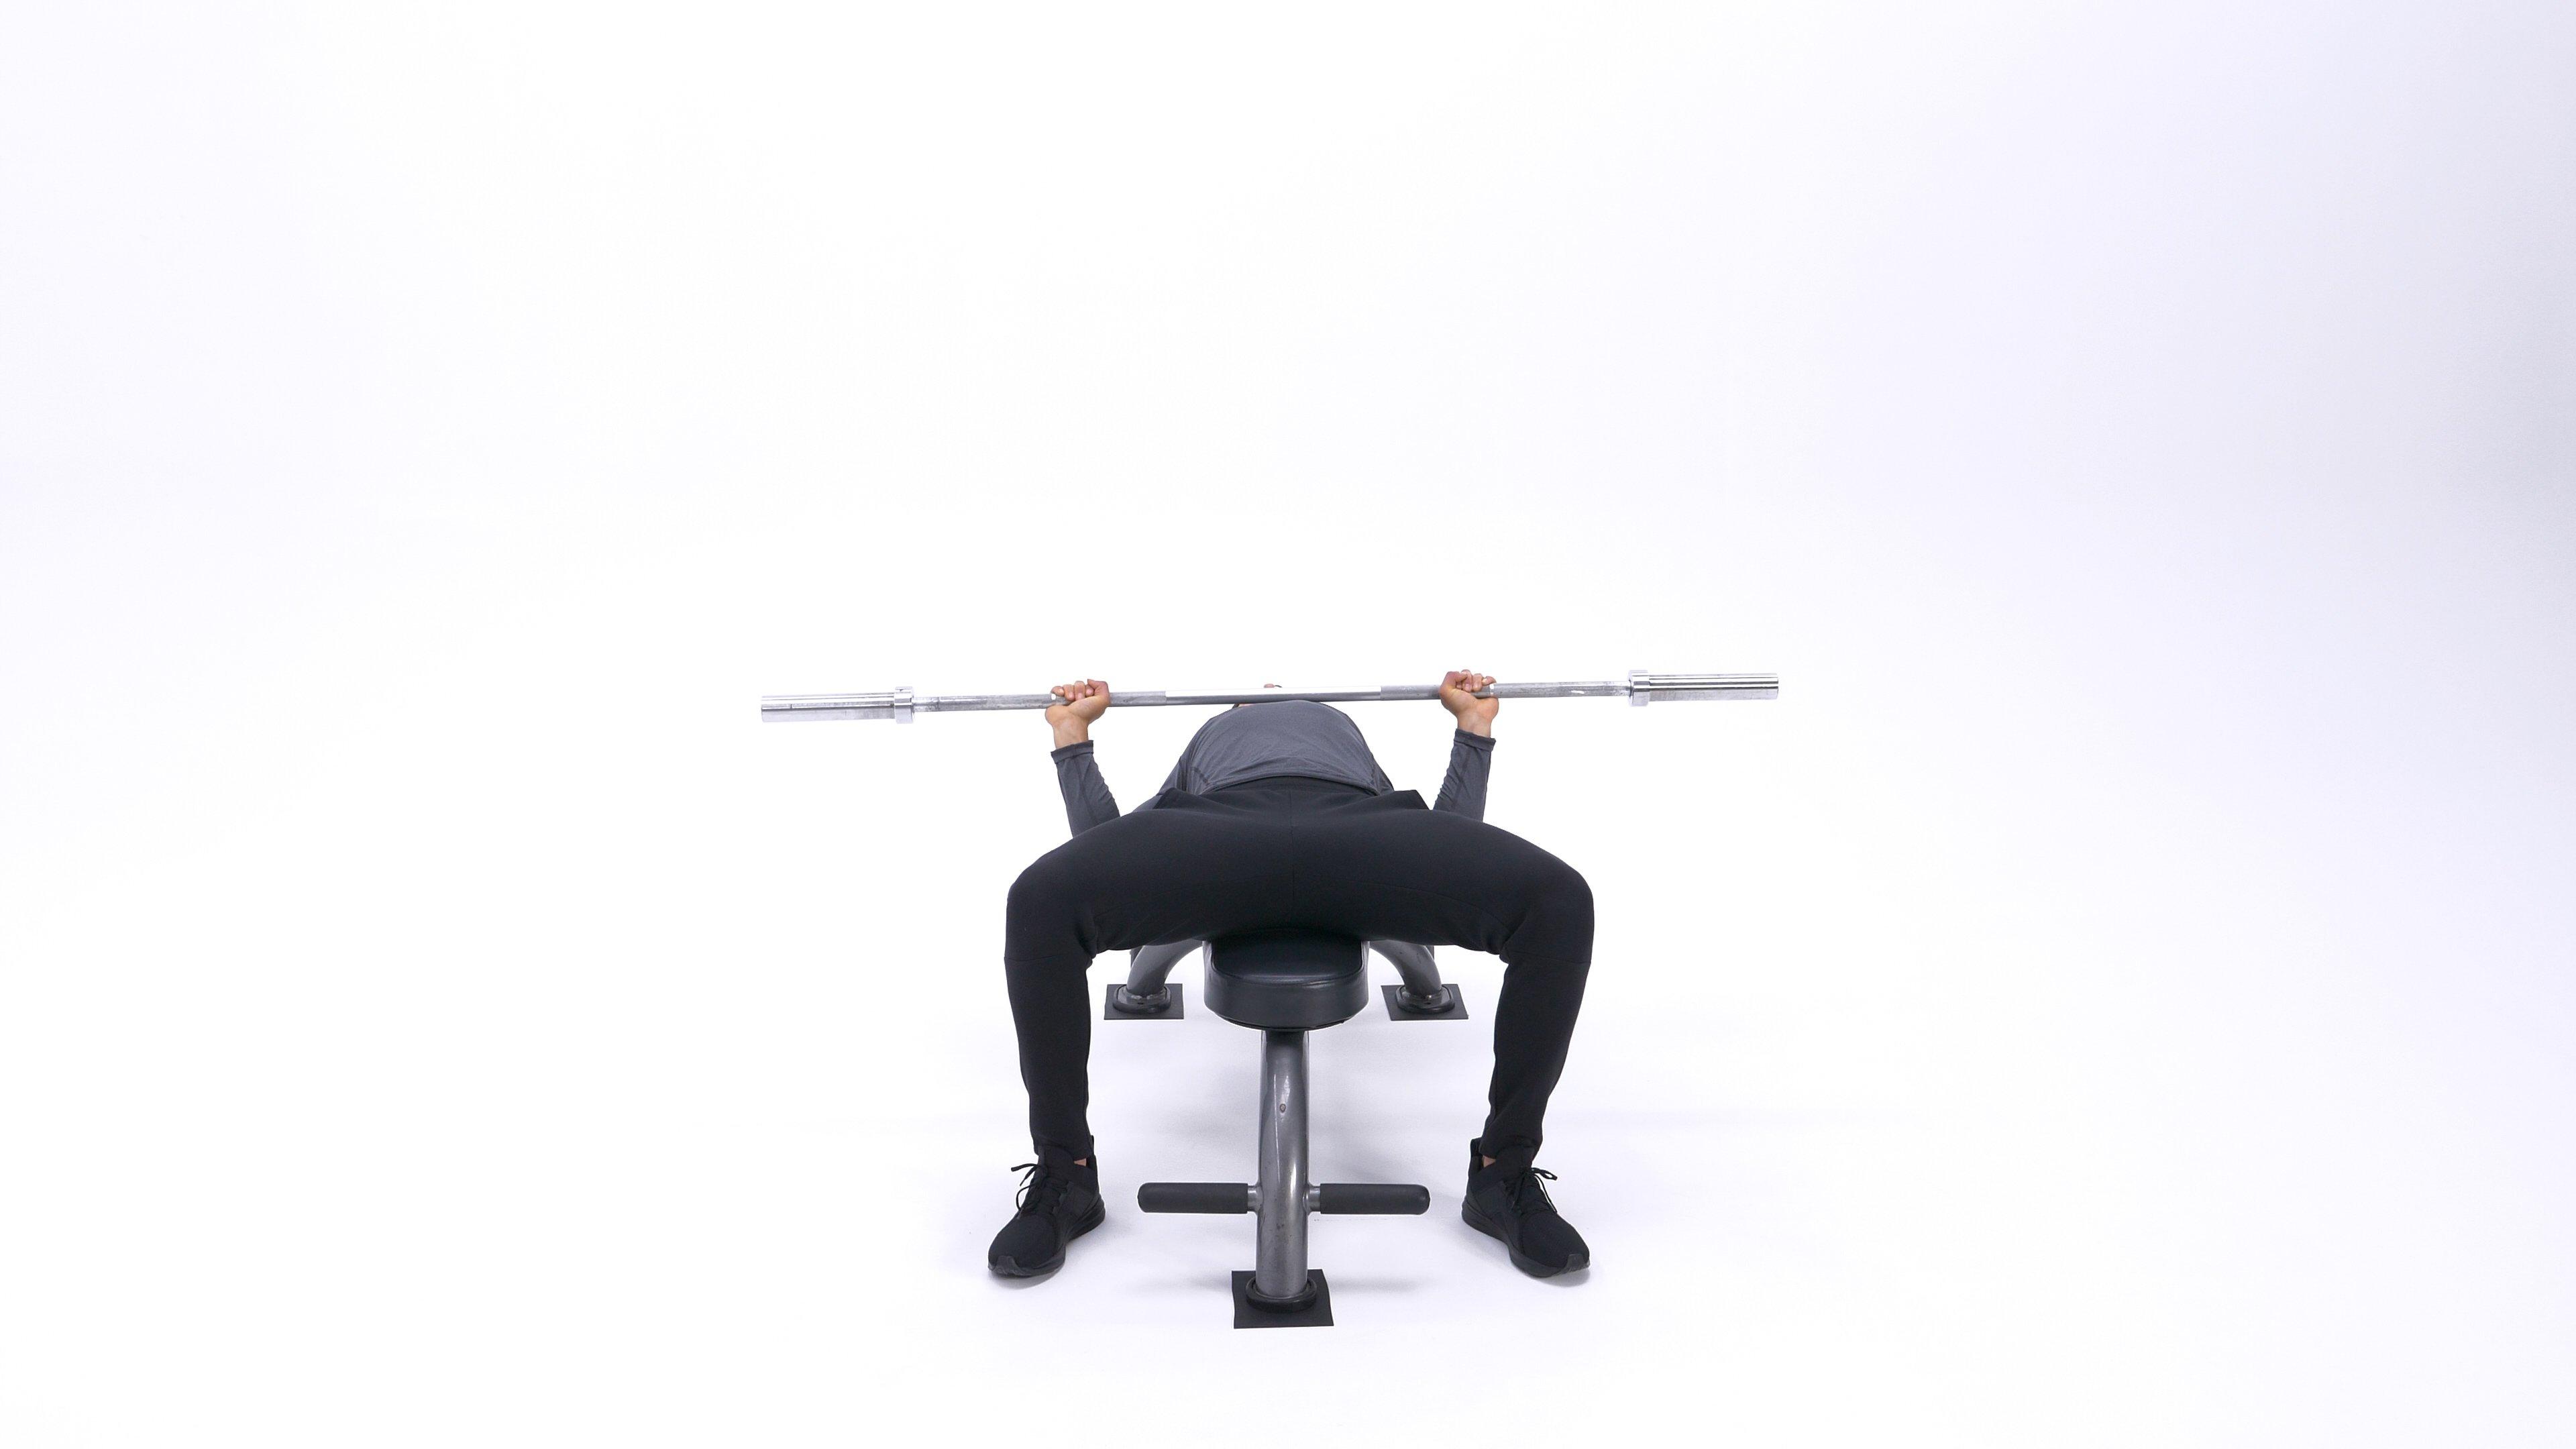 Barbell Bench Press - Medium Grip image